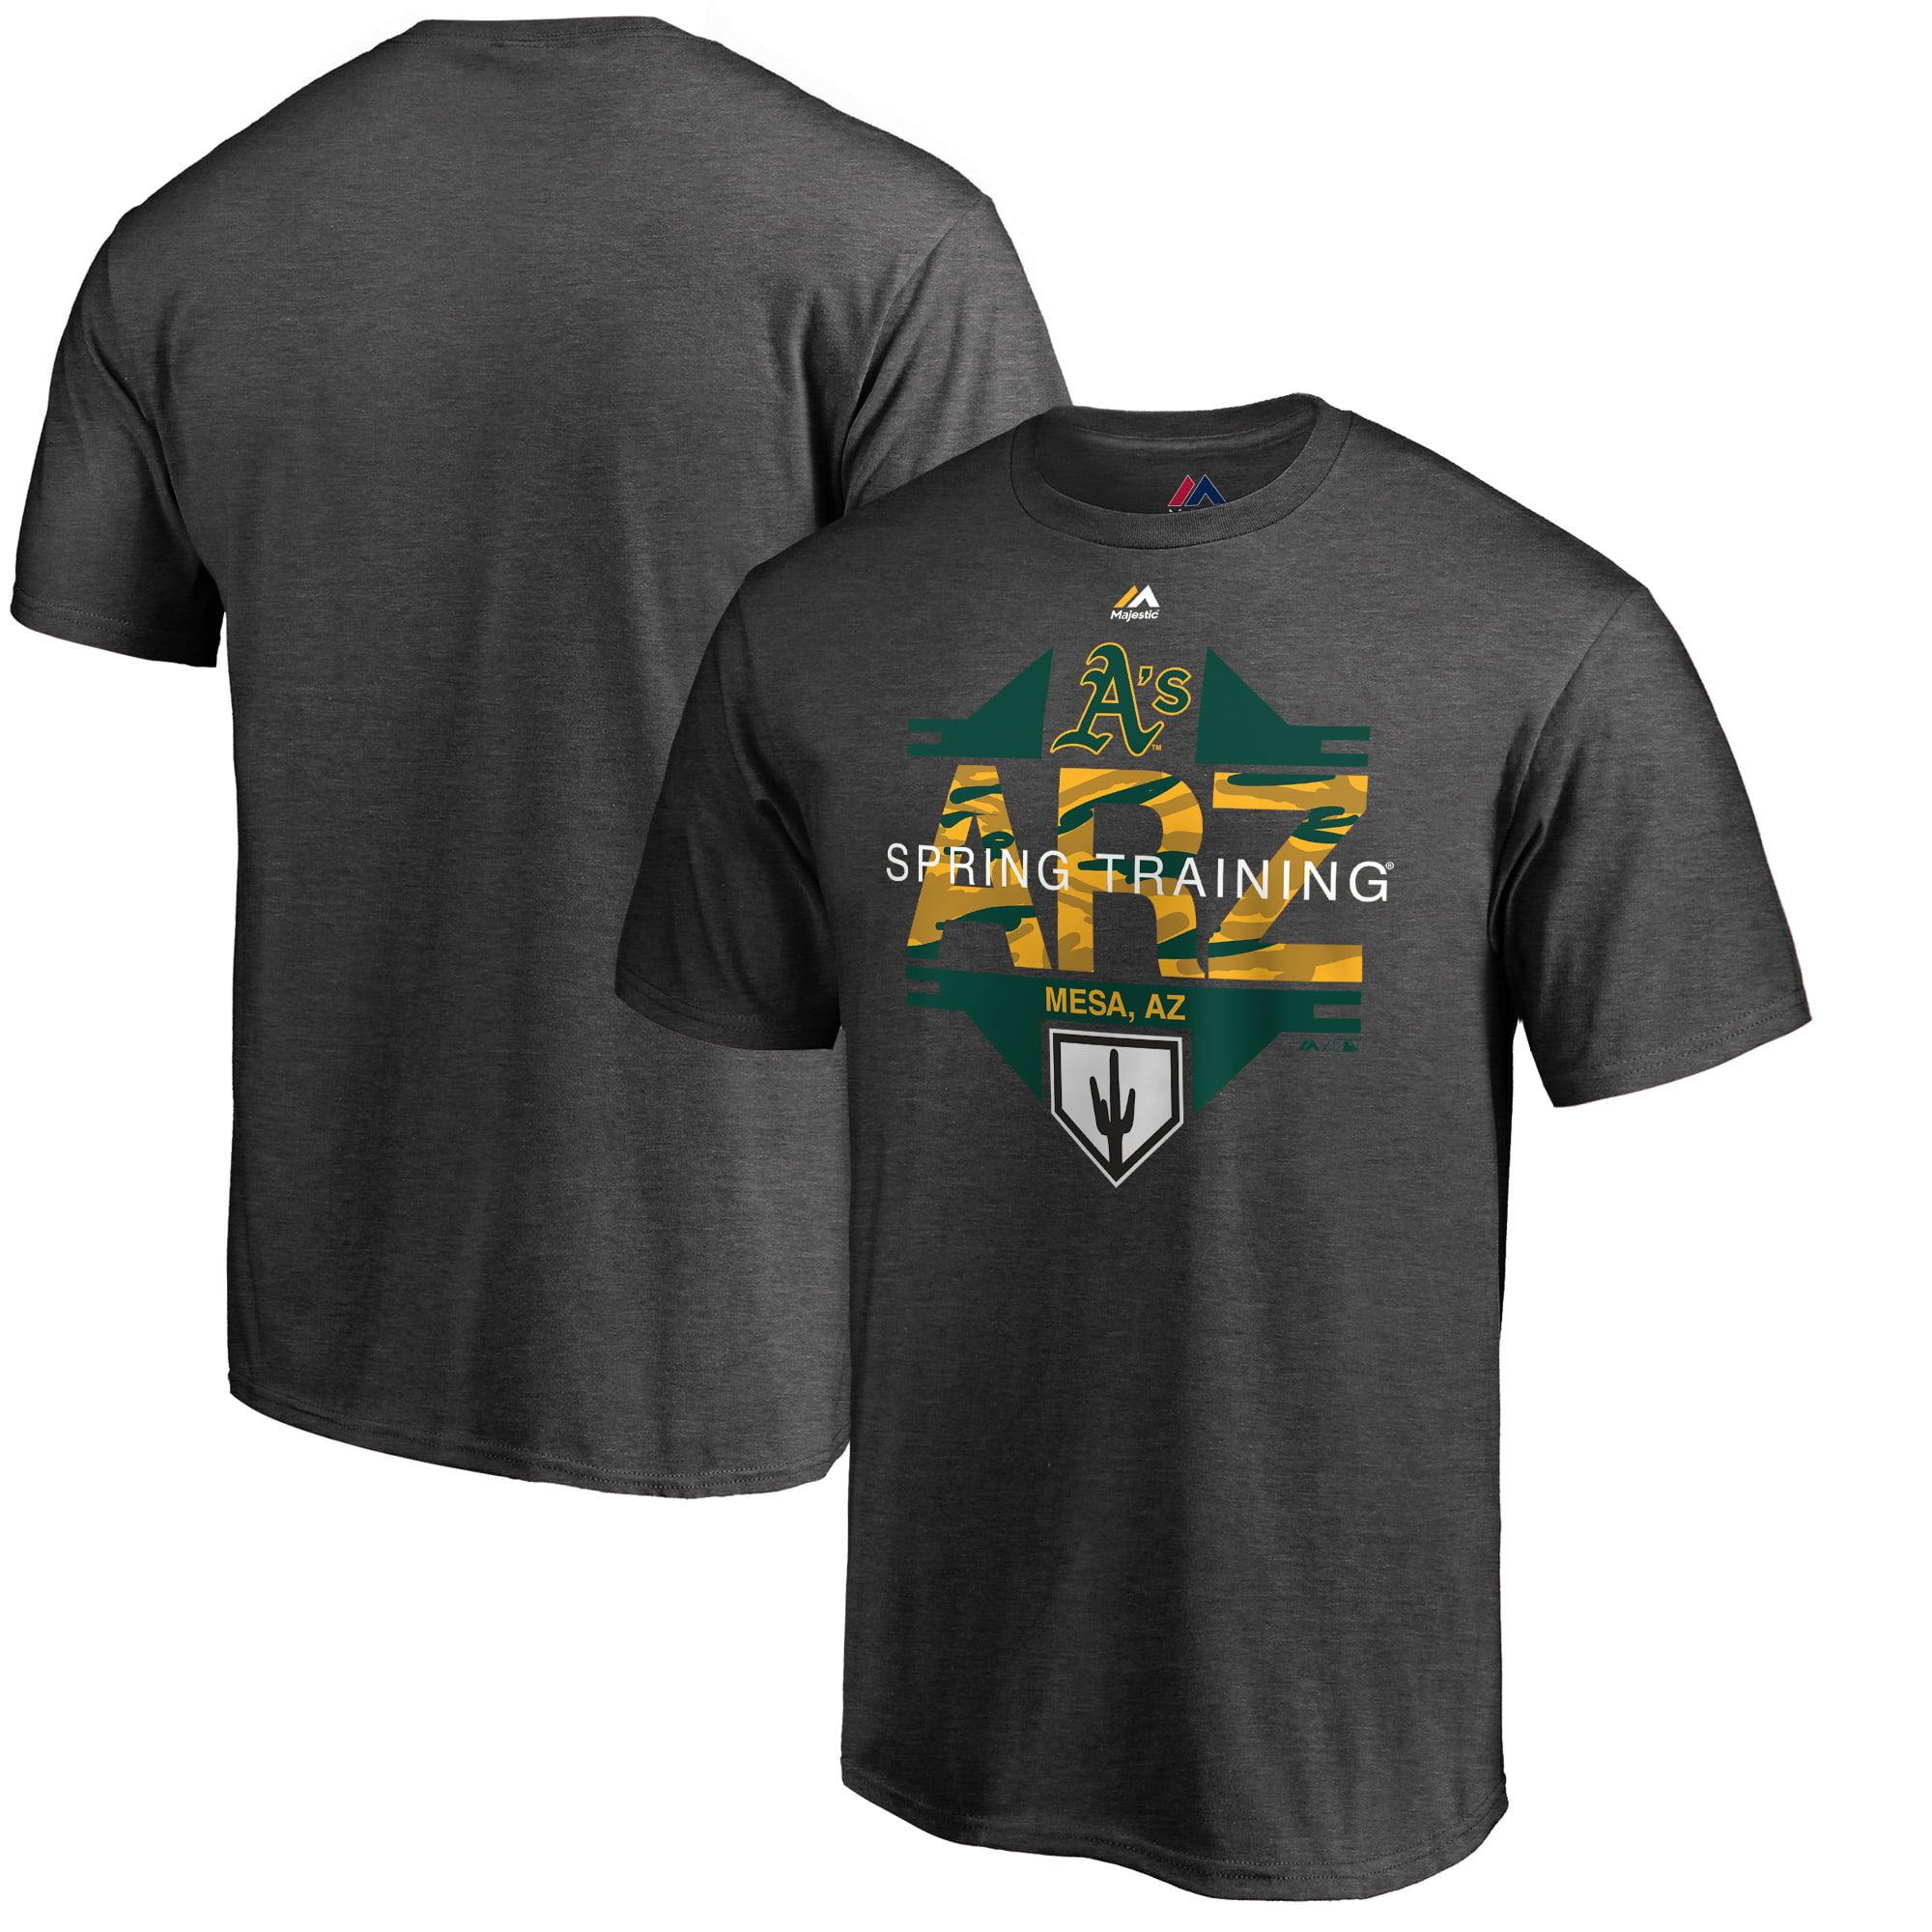 Oakland Athletics Majestic 2019 Spring Training Cactus League Winner Big & Tall T-Shirt - Heather Gray